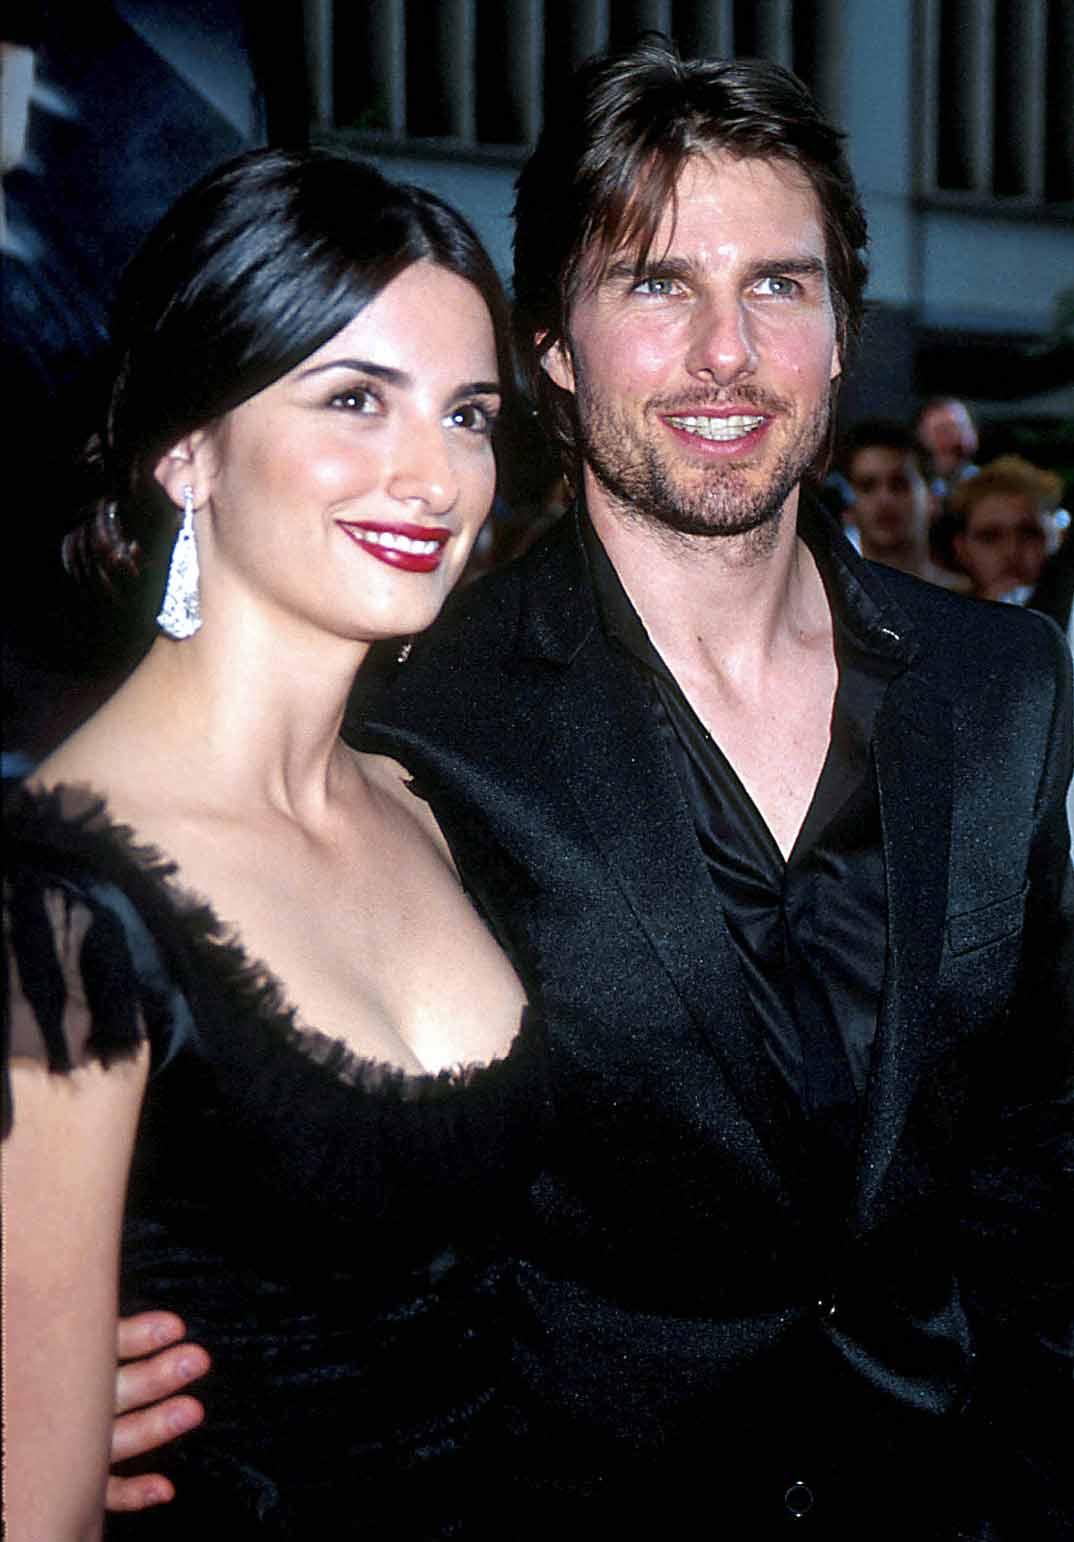 Tom-Cruise and Penelope-Cruz